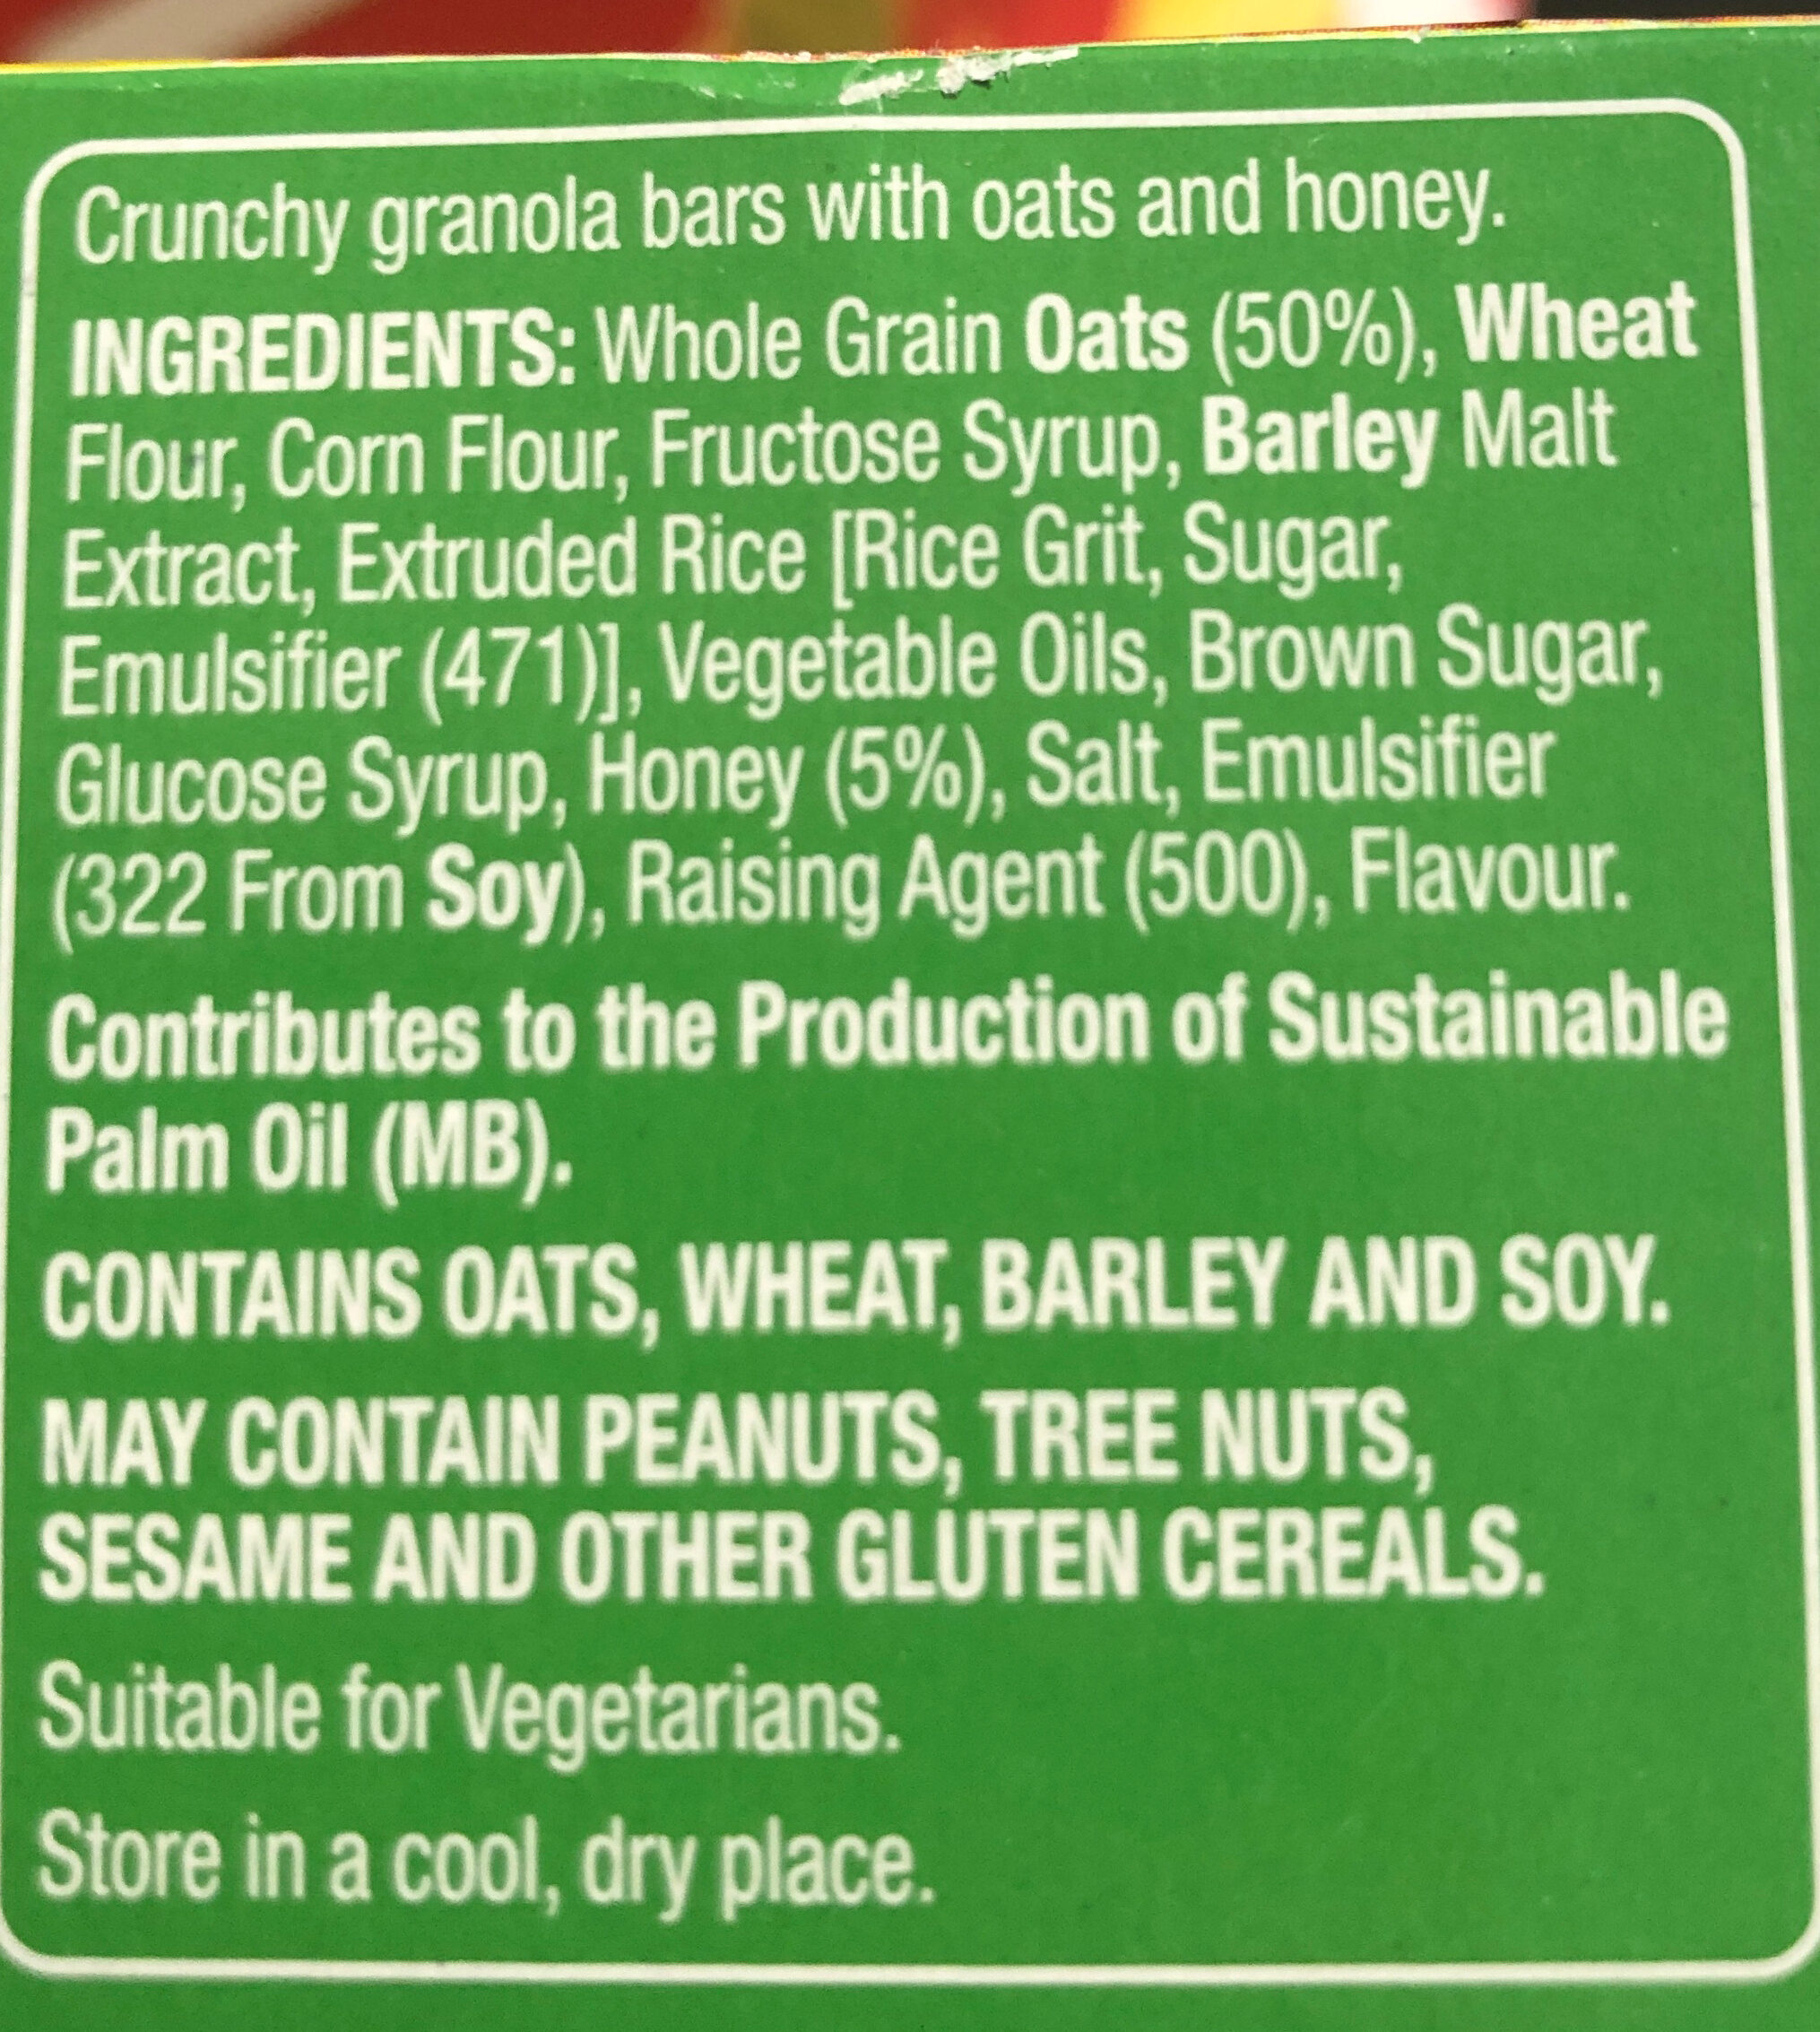 Crunchy granola bars - Ingredients